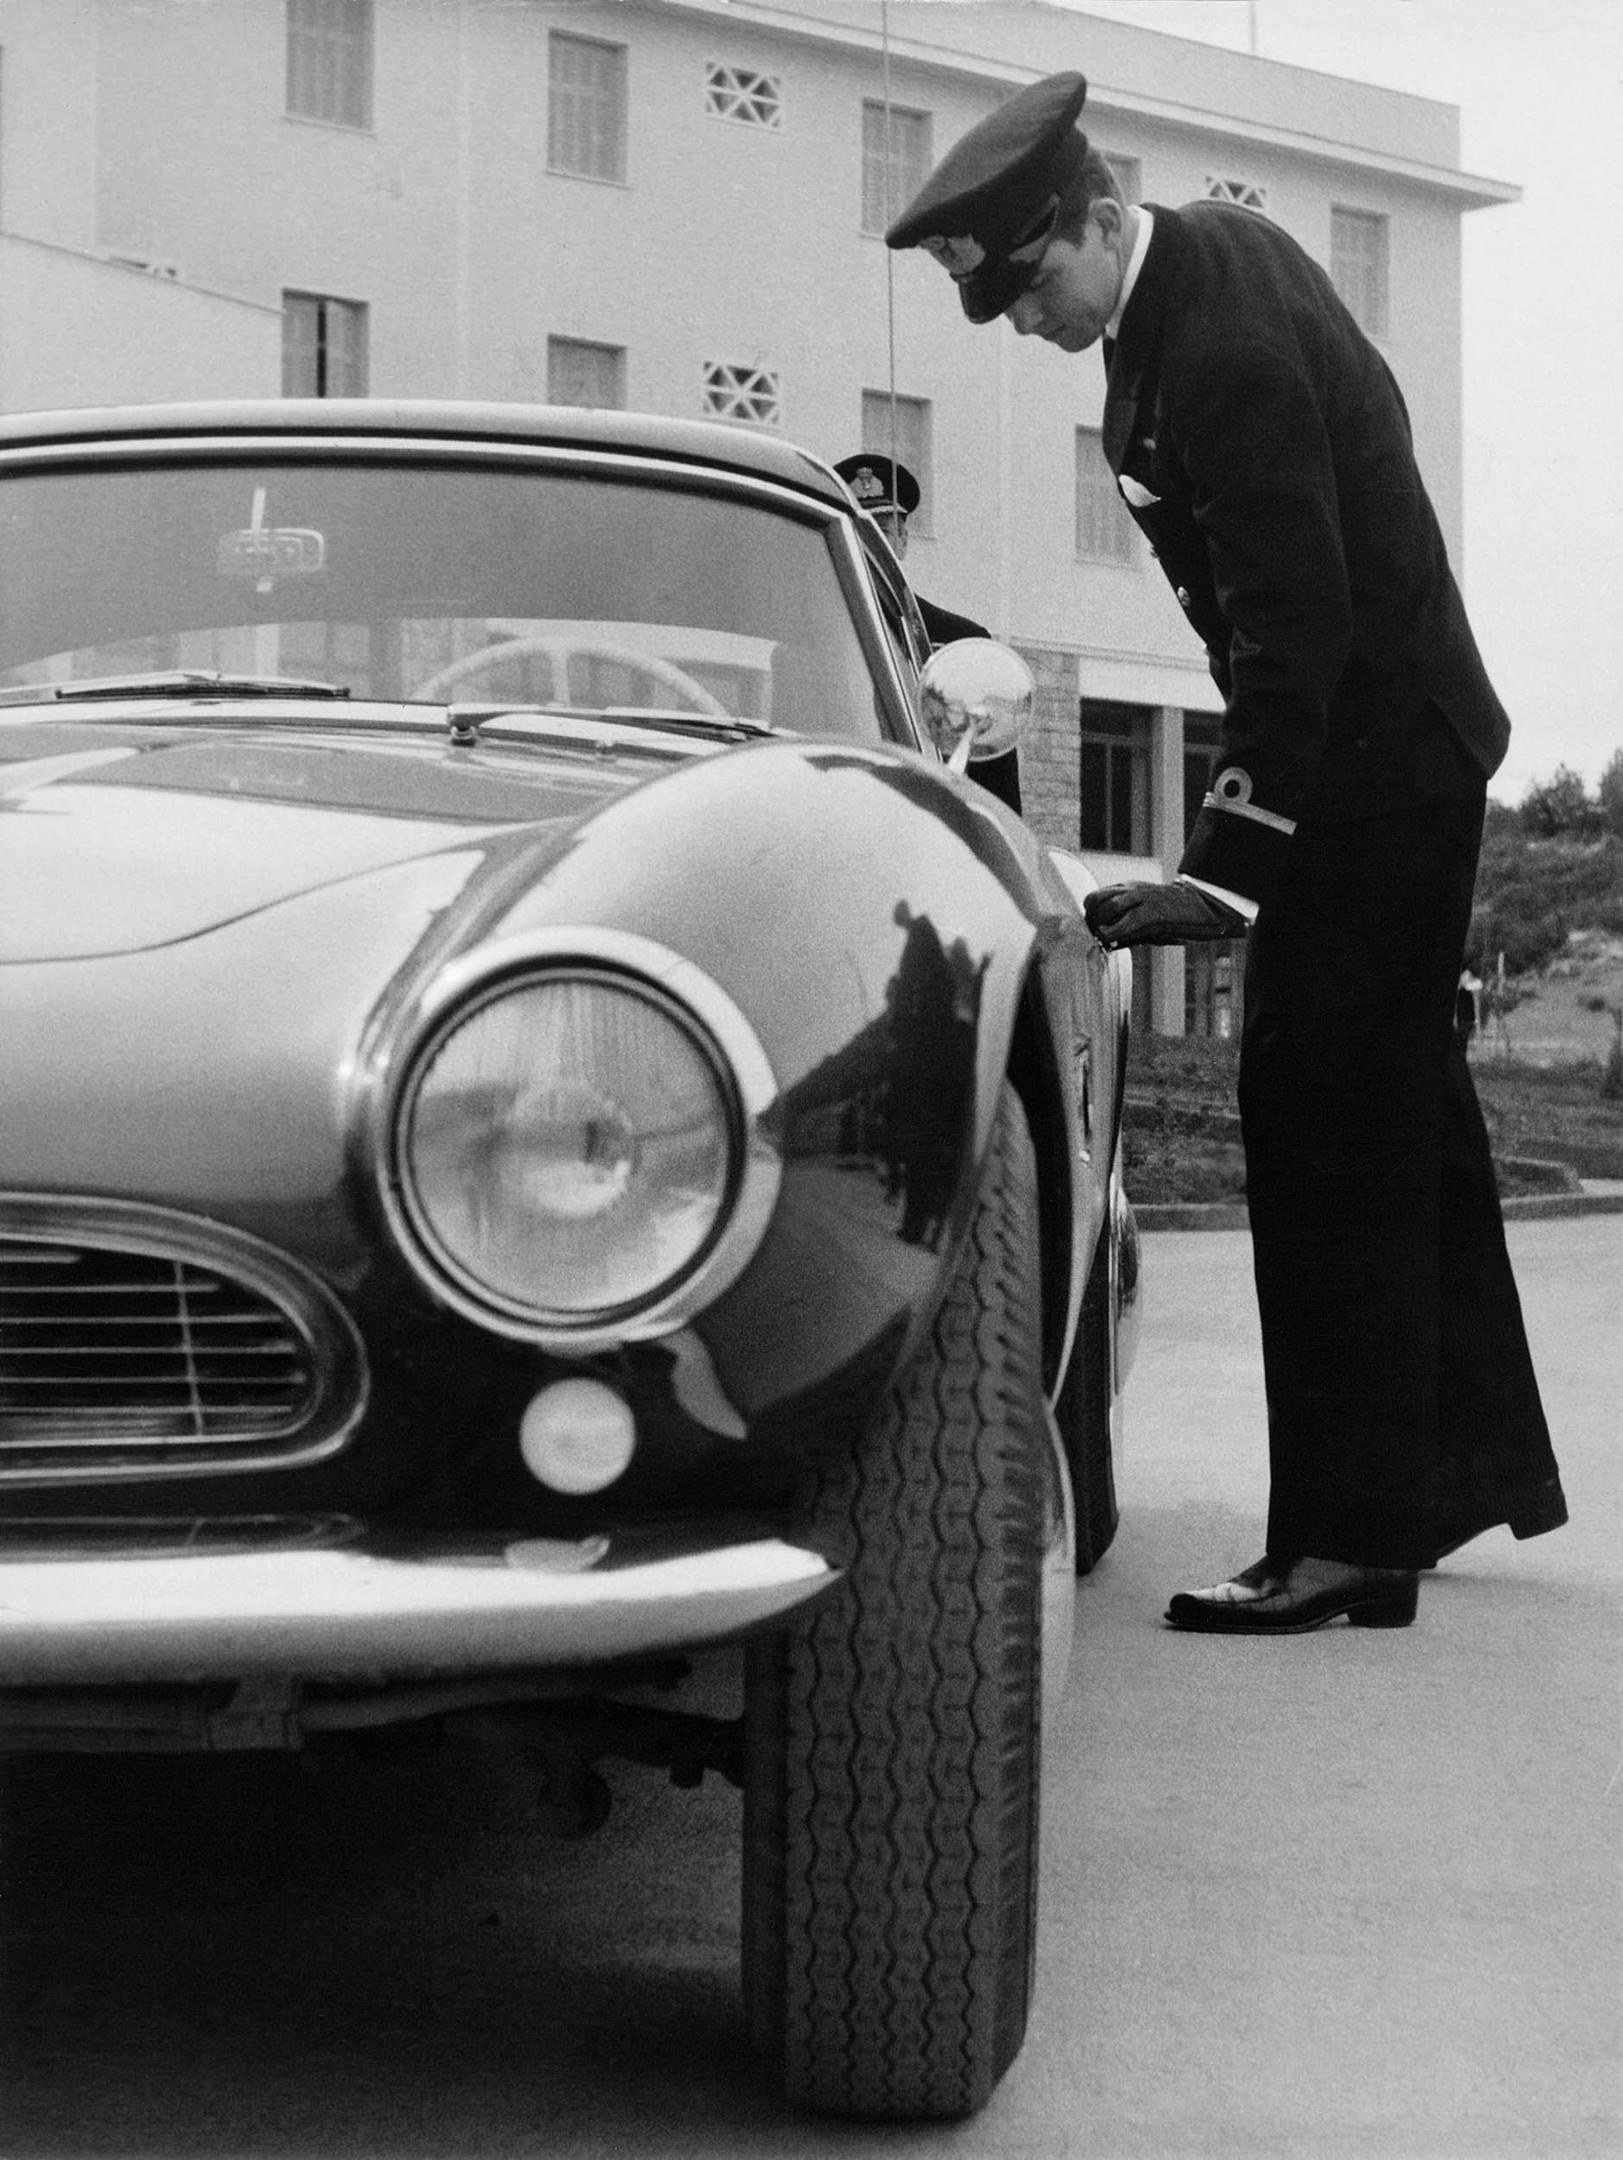 1959 BMW 507 Roadster headlight detail